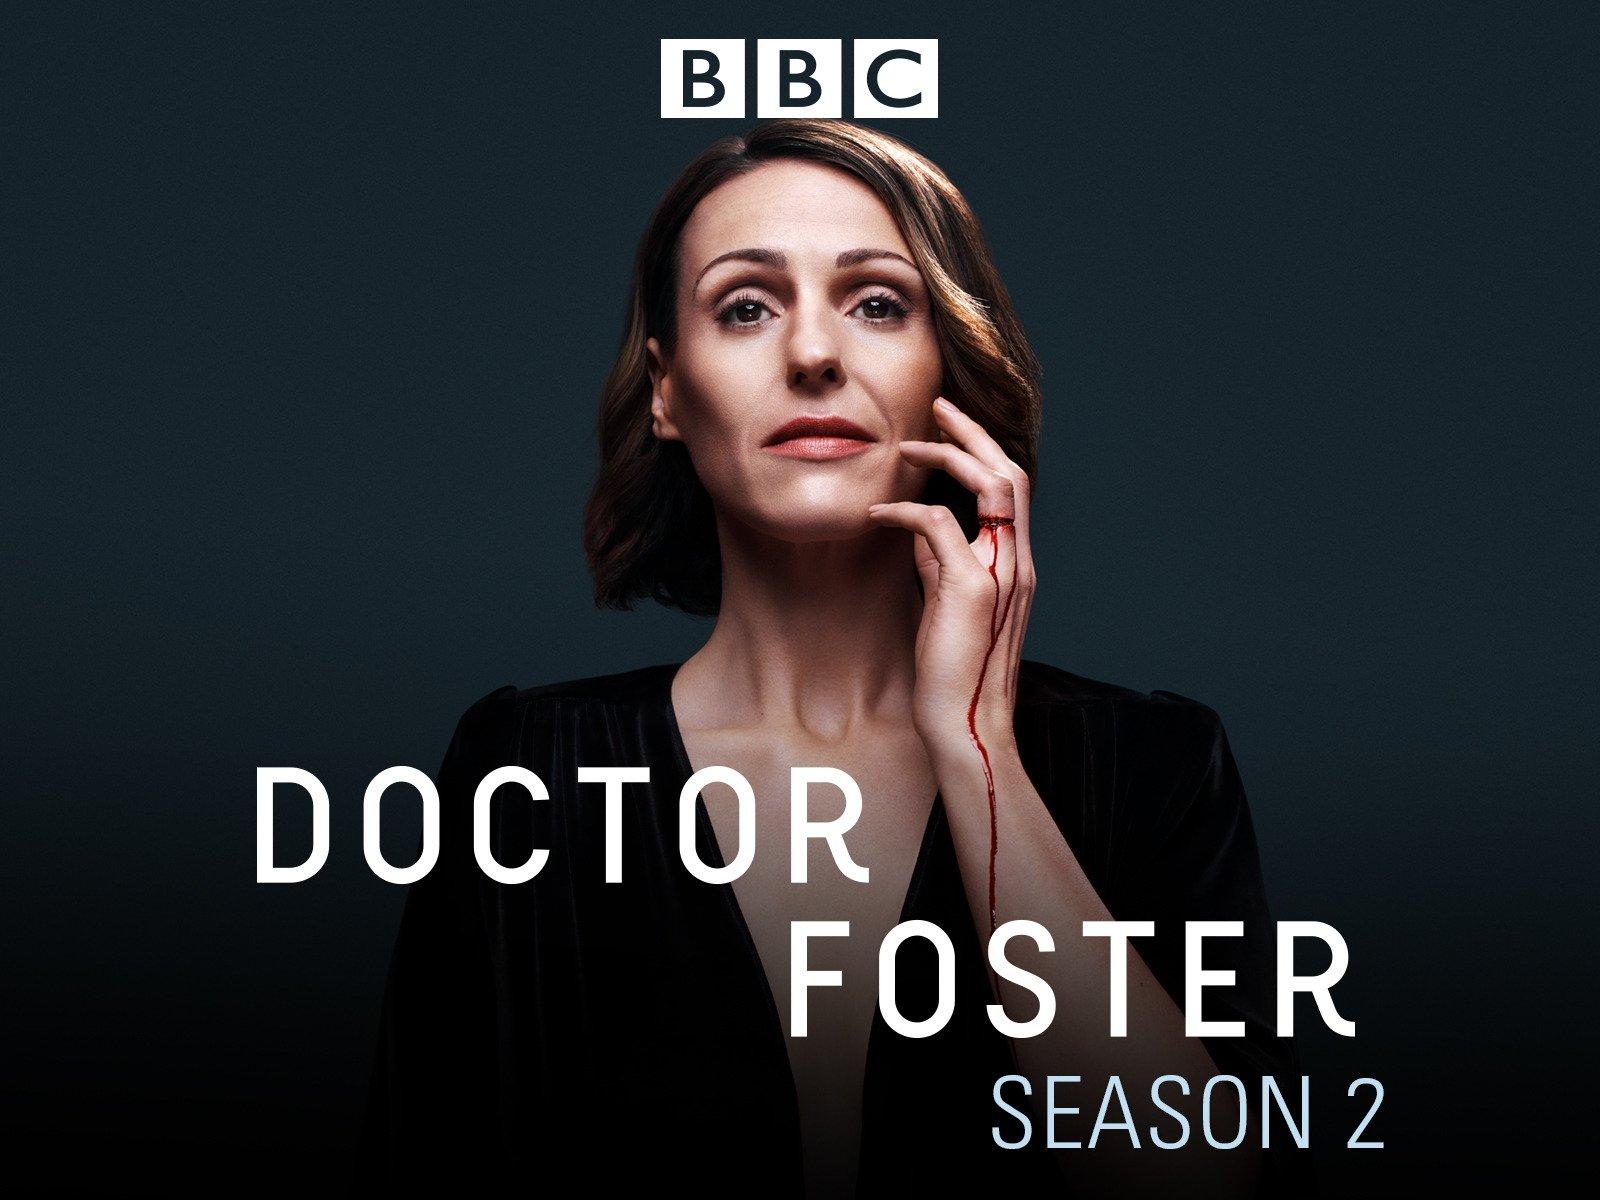 doctor foster episode 1 watch online free